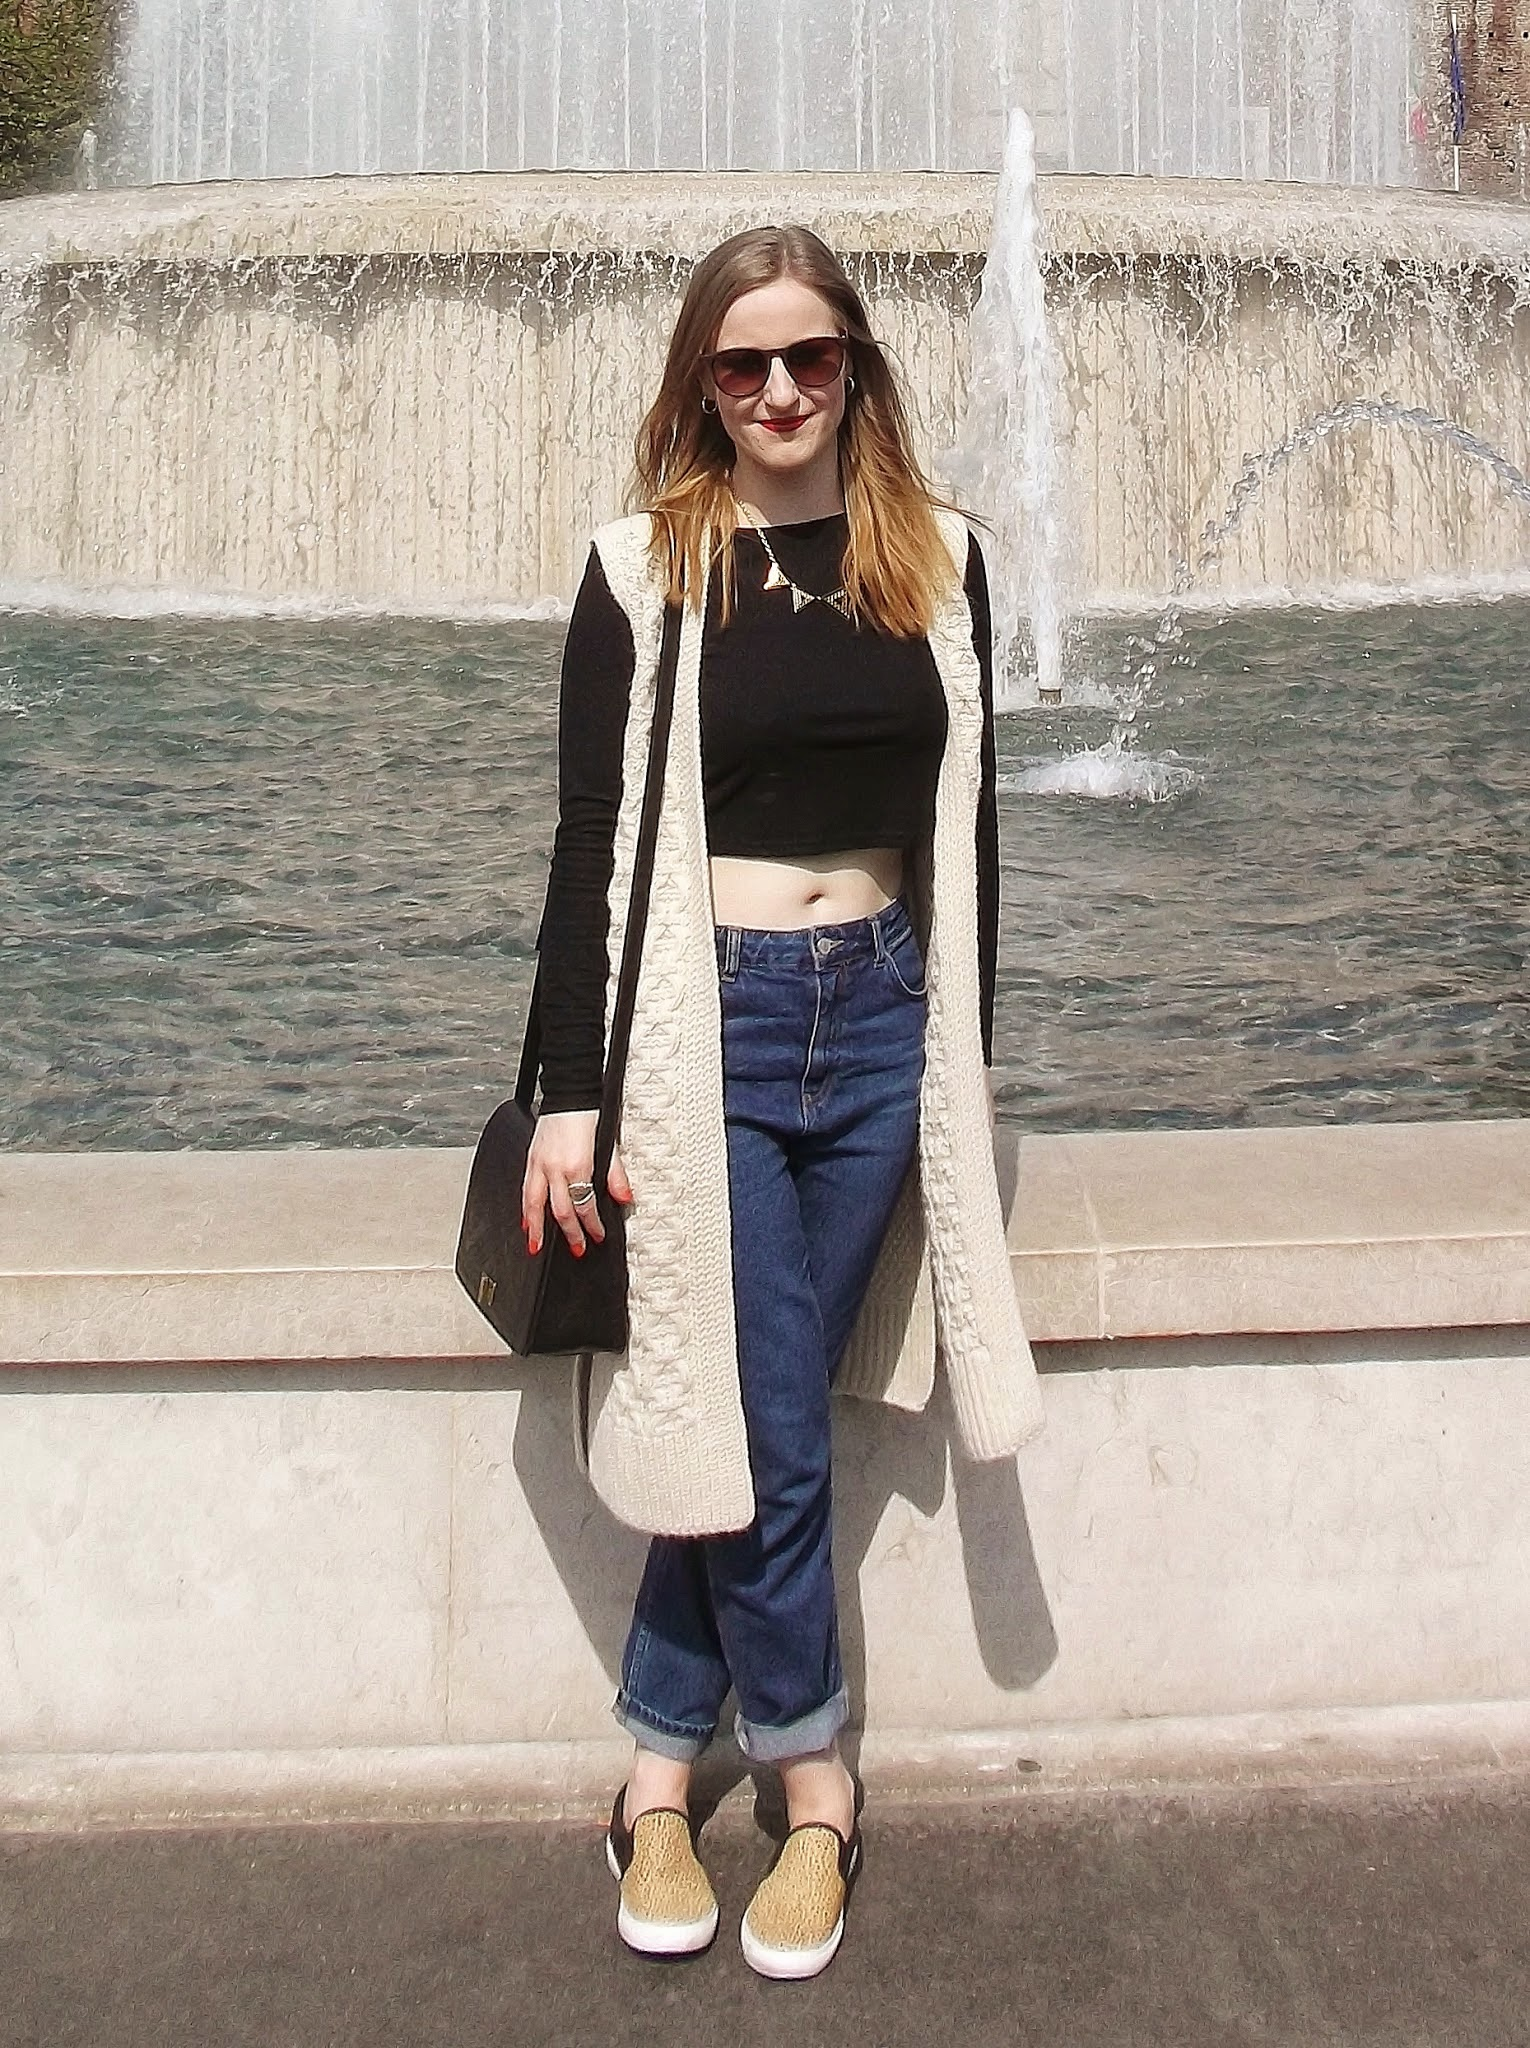 outfit: black long sleeved crop top, sleeveless cream cardigan, dark blue mum fit jeans, leopard print pumps